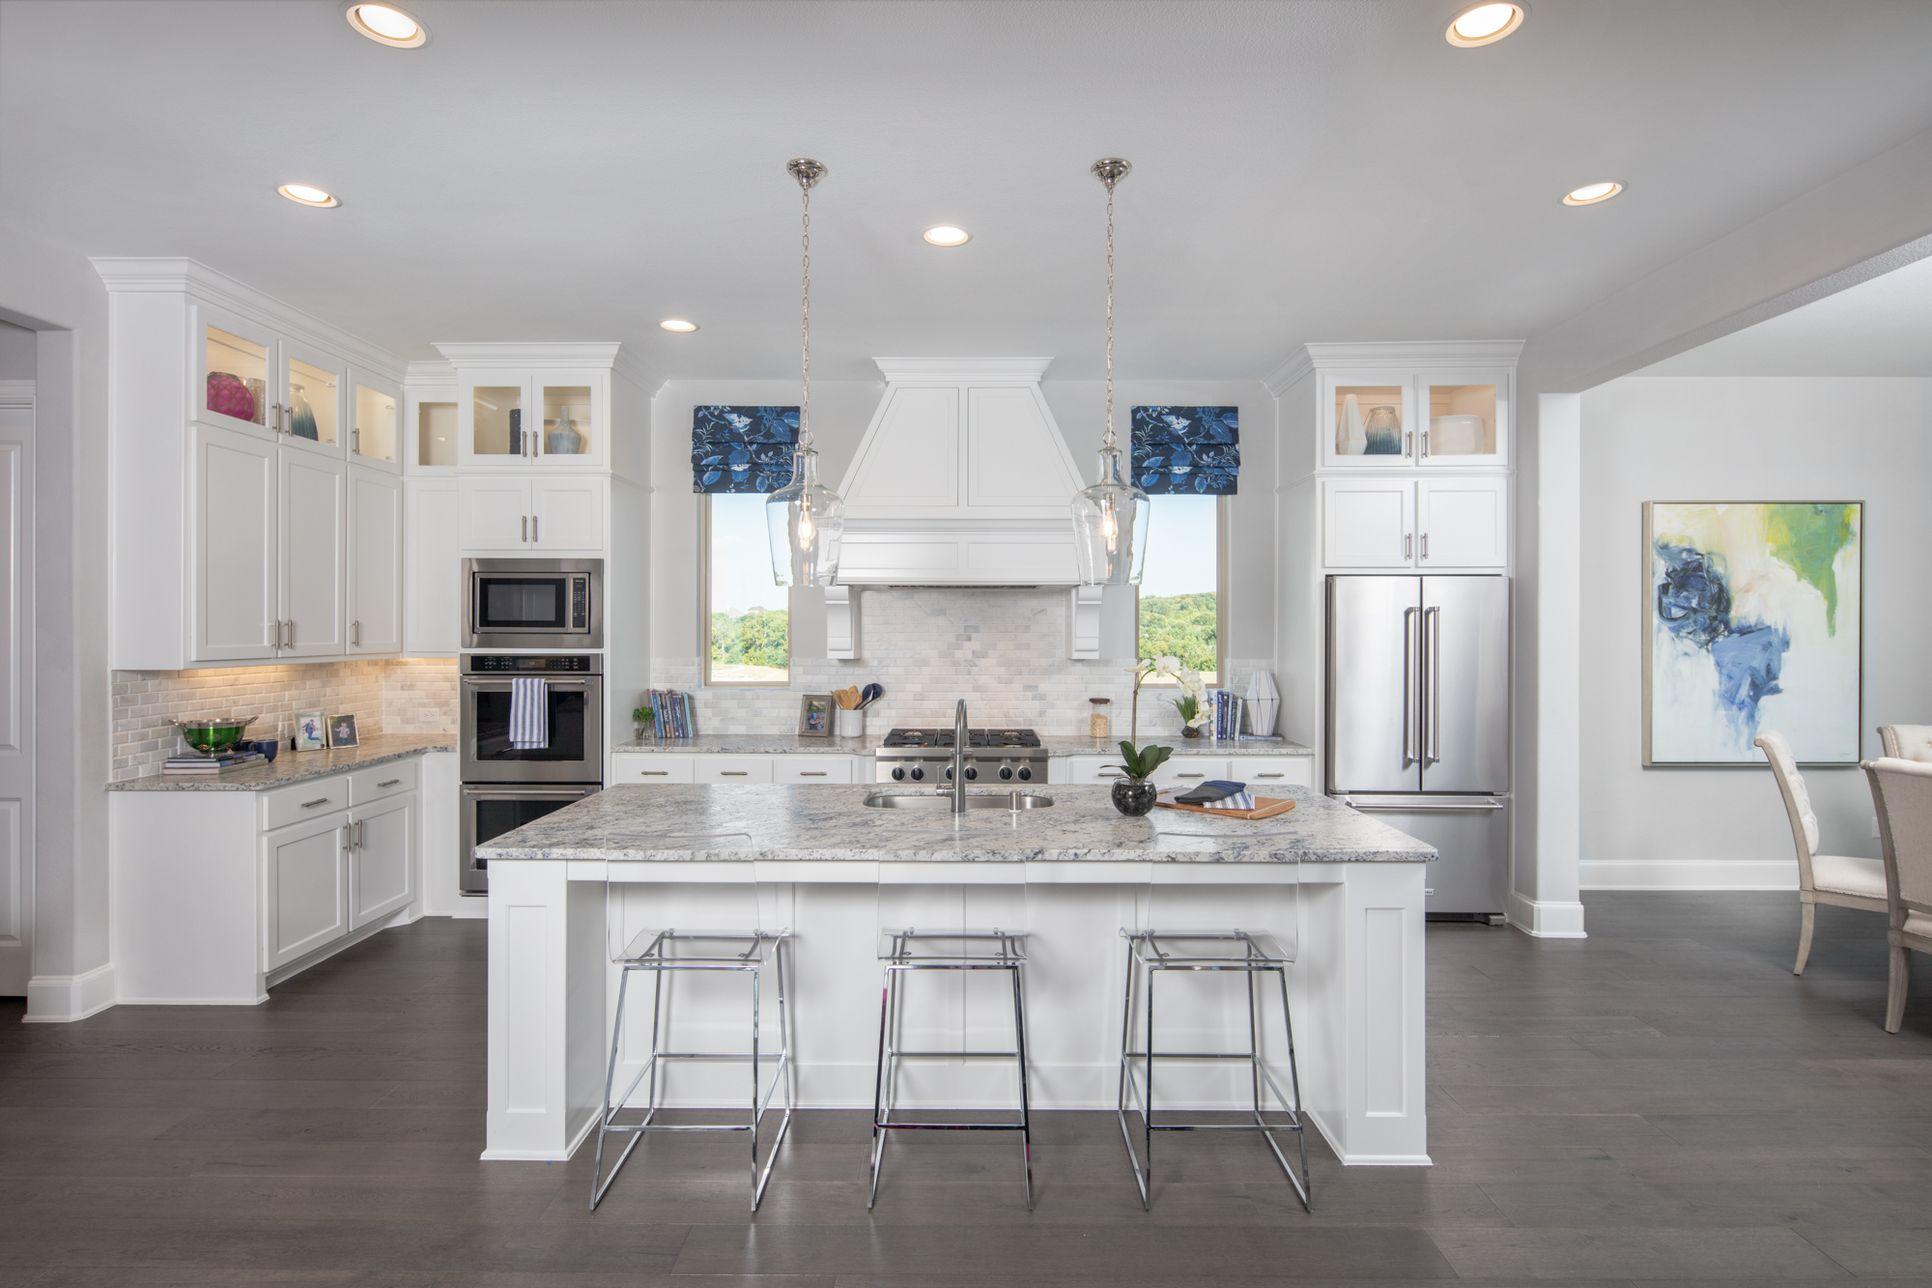 Interior:Plan B834 Kitchen Representative Image